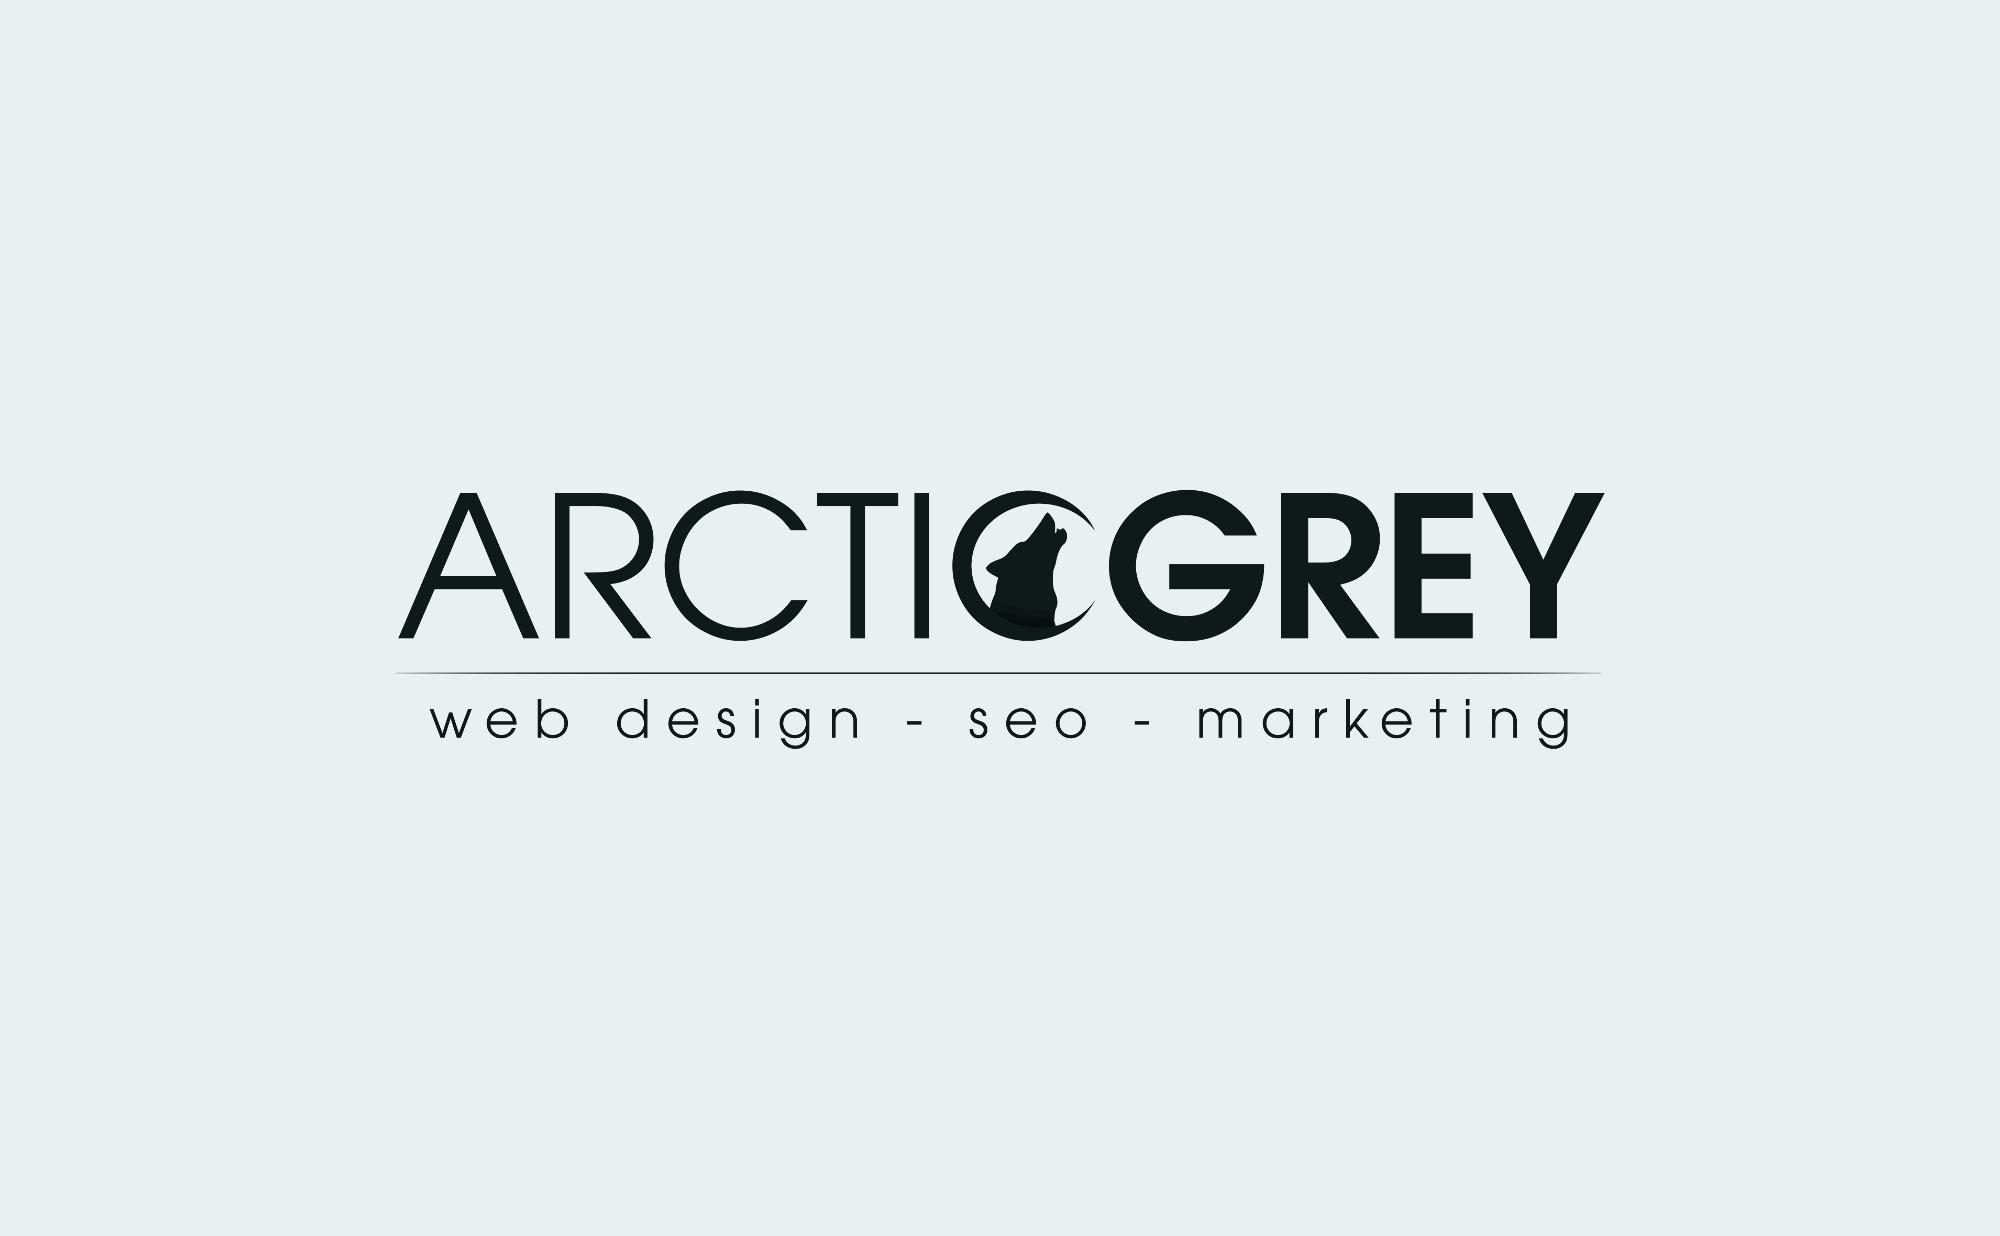 Best Seo Web Design Firms List Of Seo Web Developers Aug